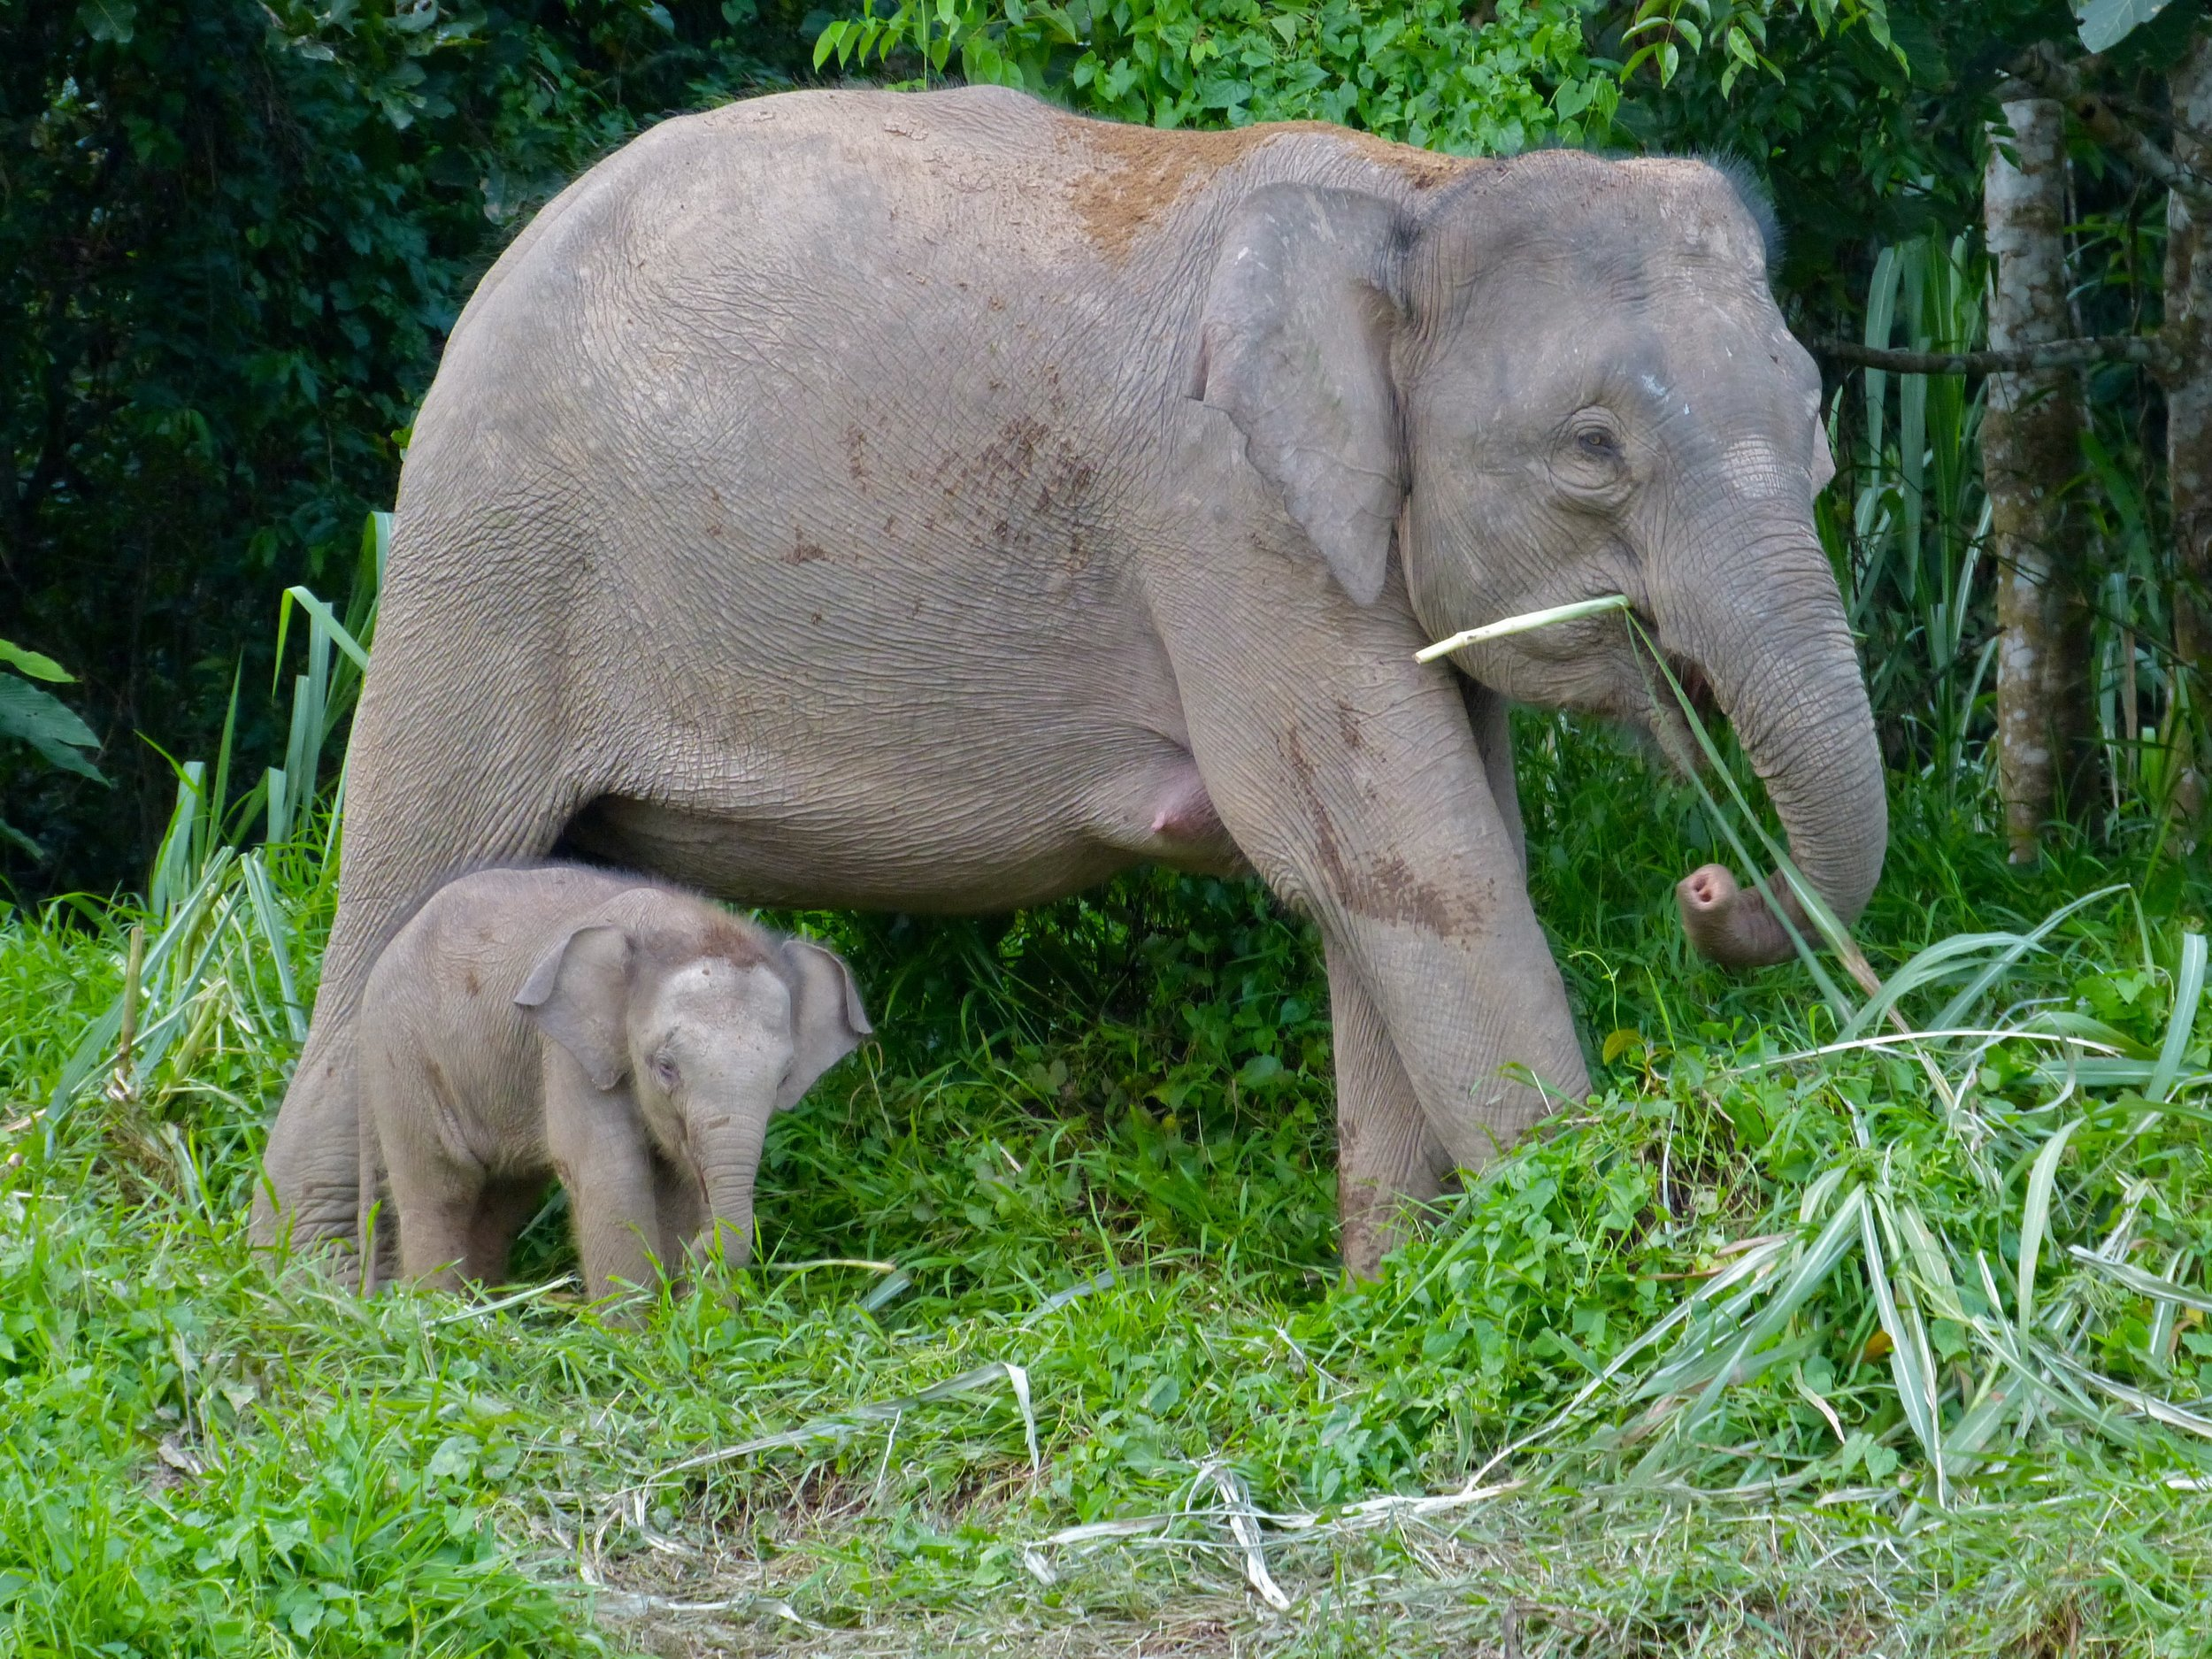 Pygmy_Elephants_(Elephas_maximus_borneensis)_mother_and_baby_(8074160345).jpg